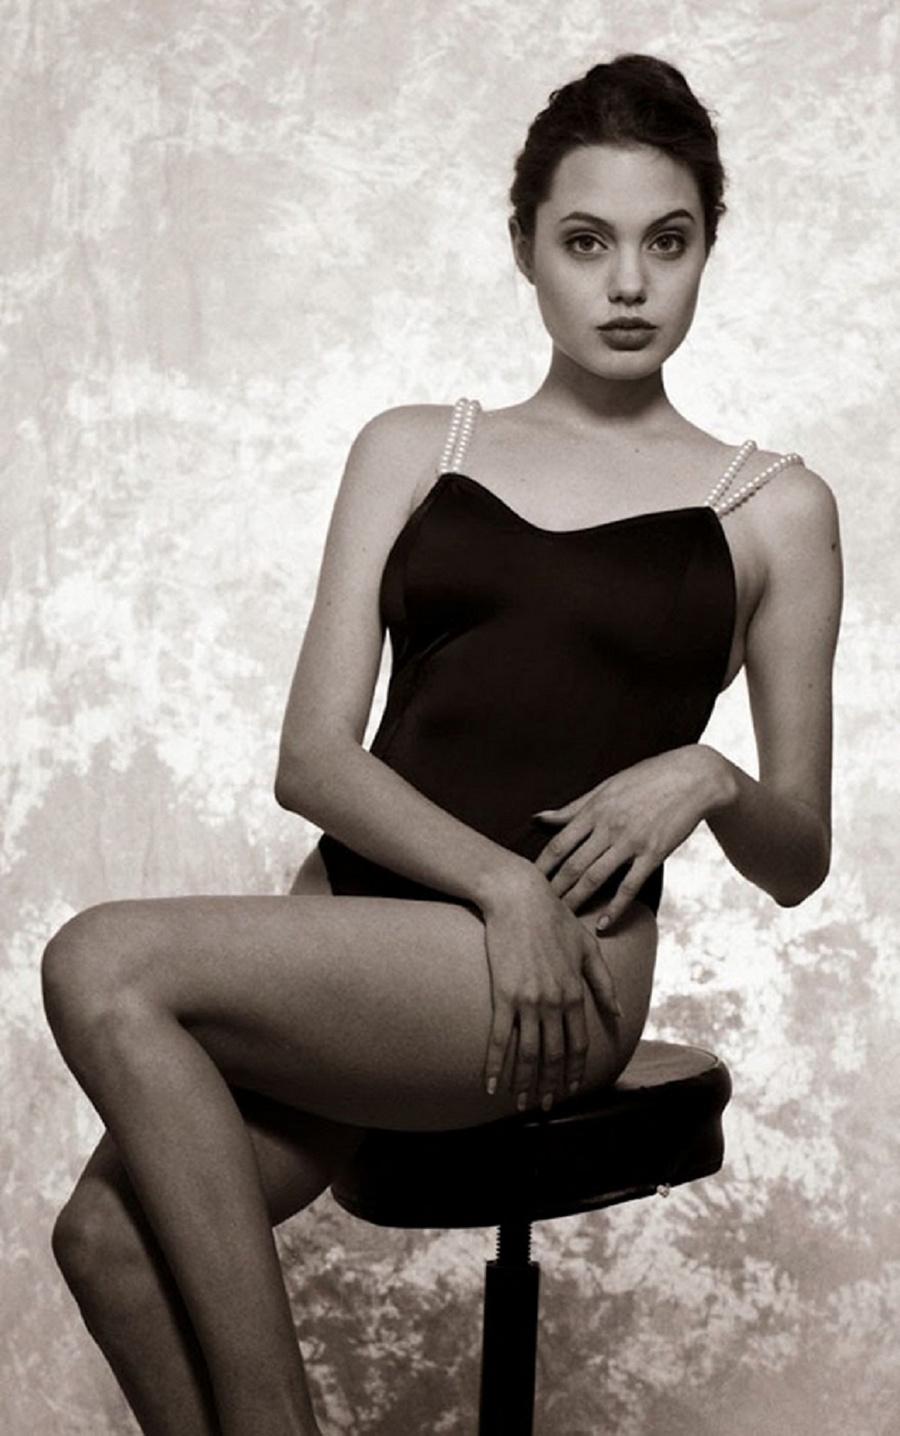 Гарри Лэнгдон фотосессия Анджелины Джоли 19